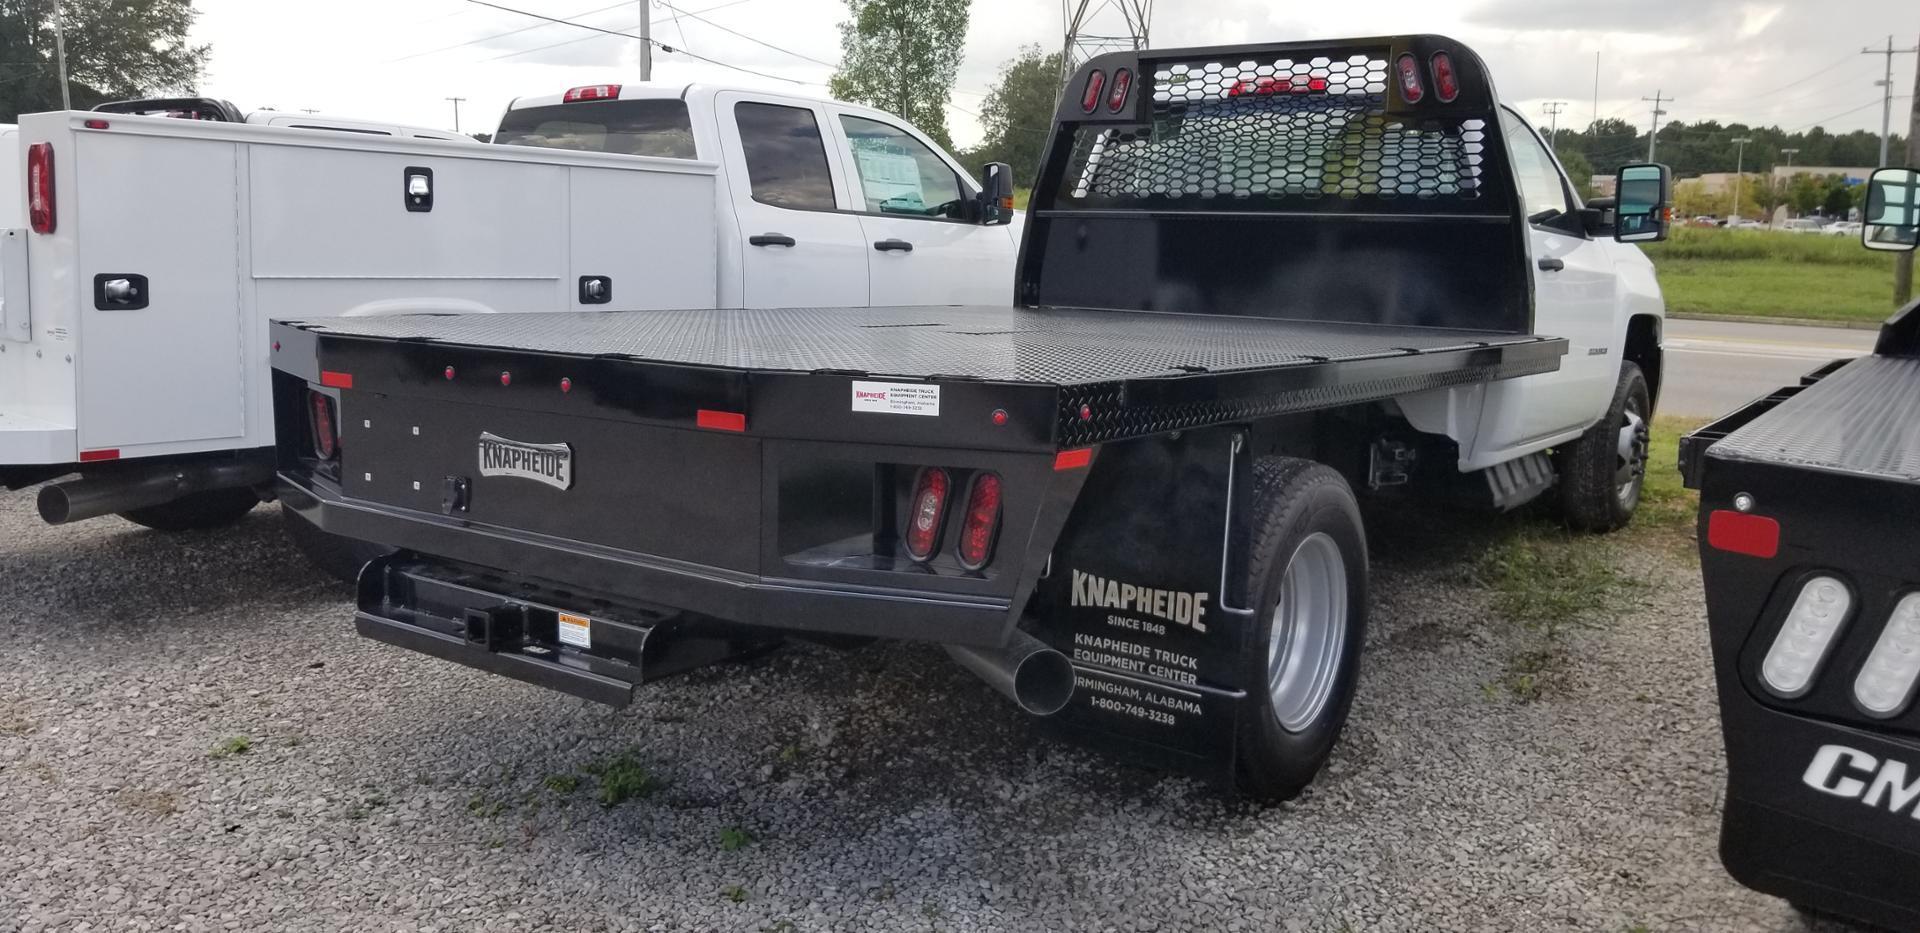 chevrolet platform body trucks decatur al. Black Bedroom Furniture Sets. Home Design Ideas